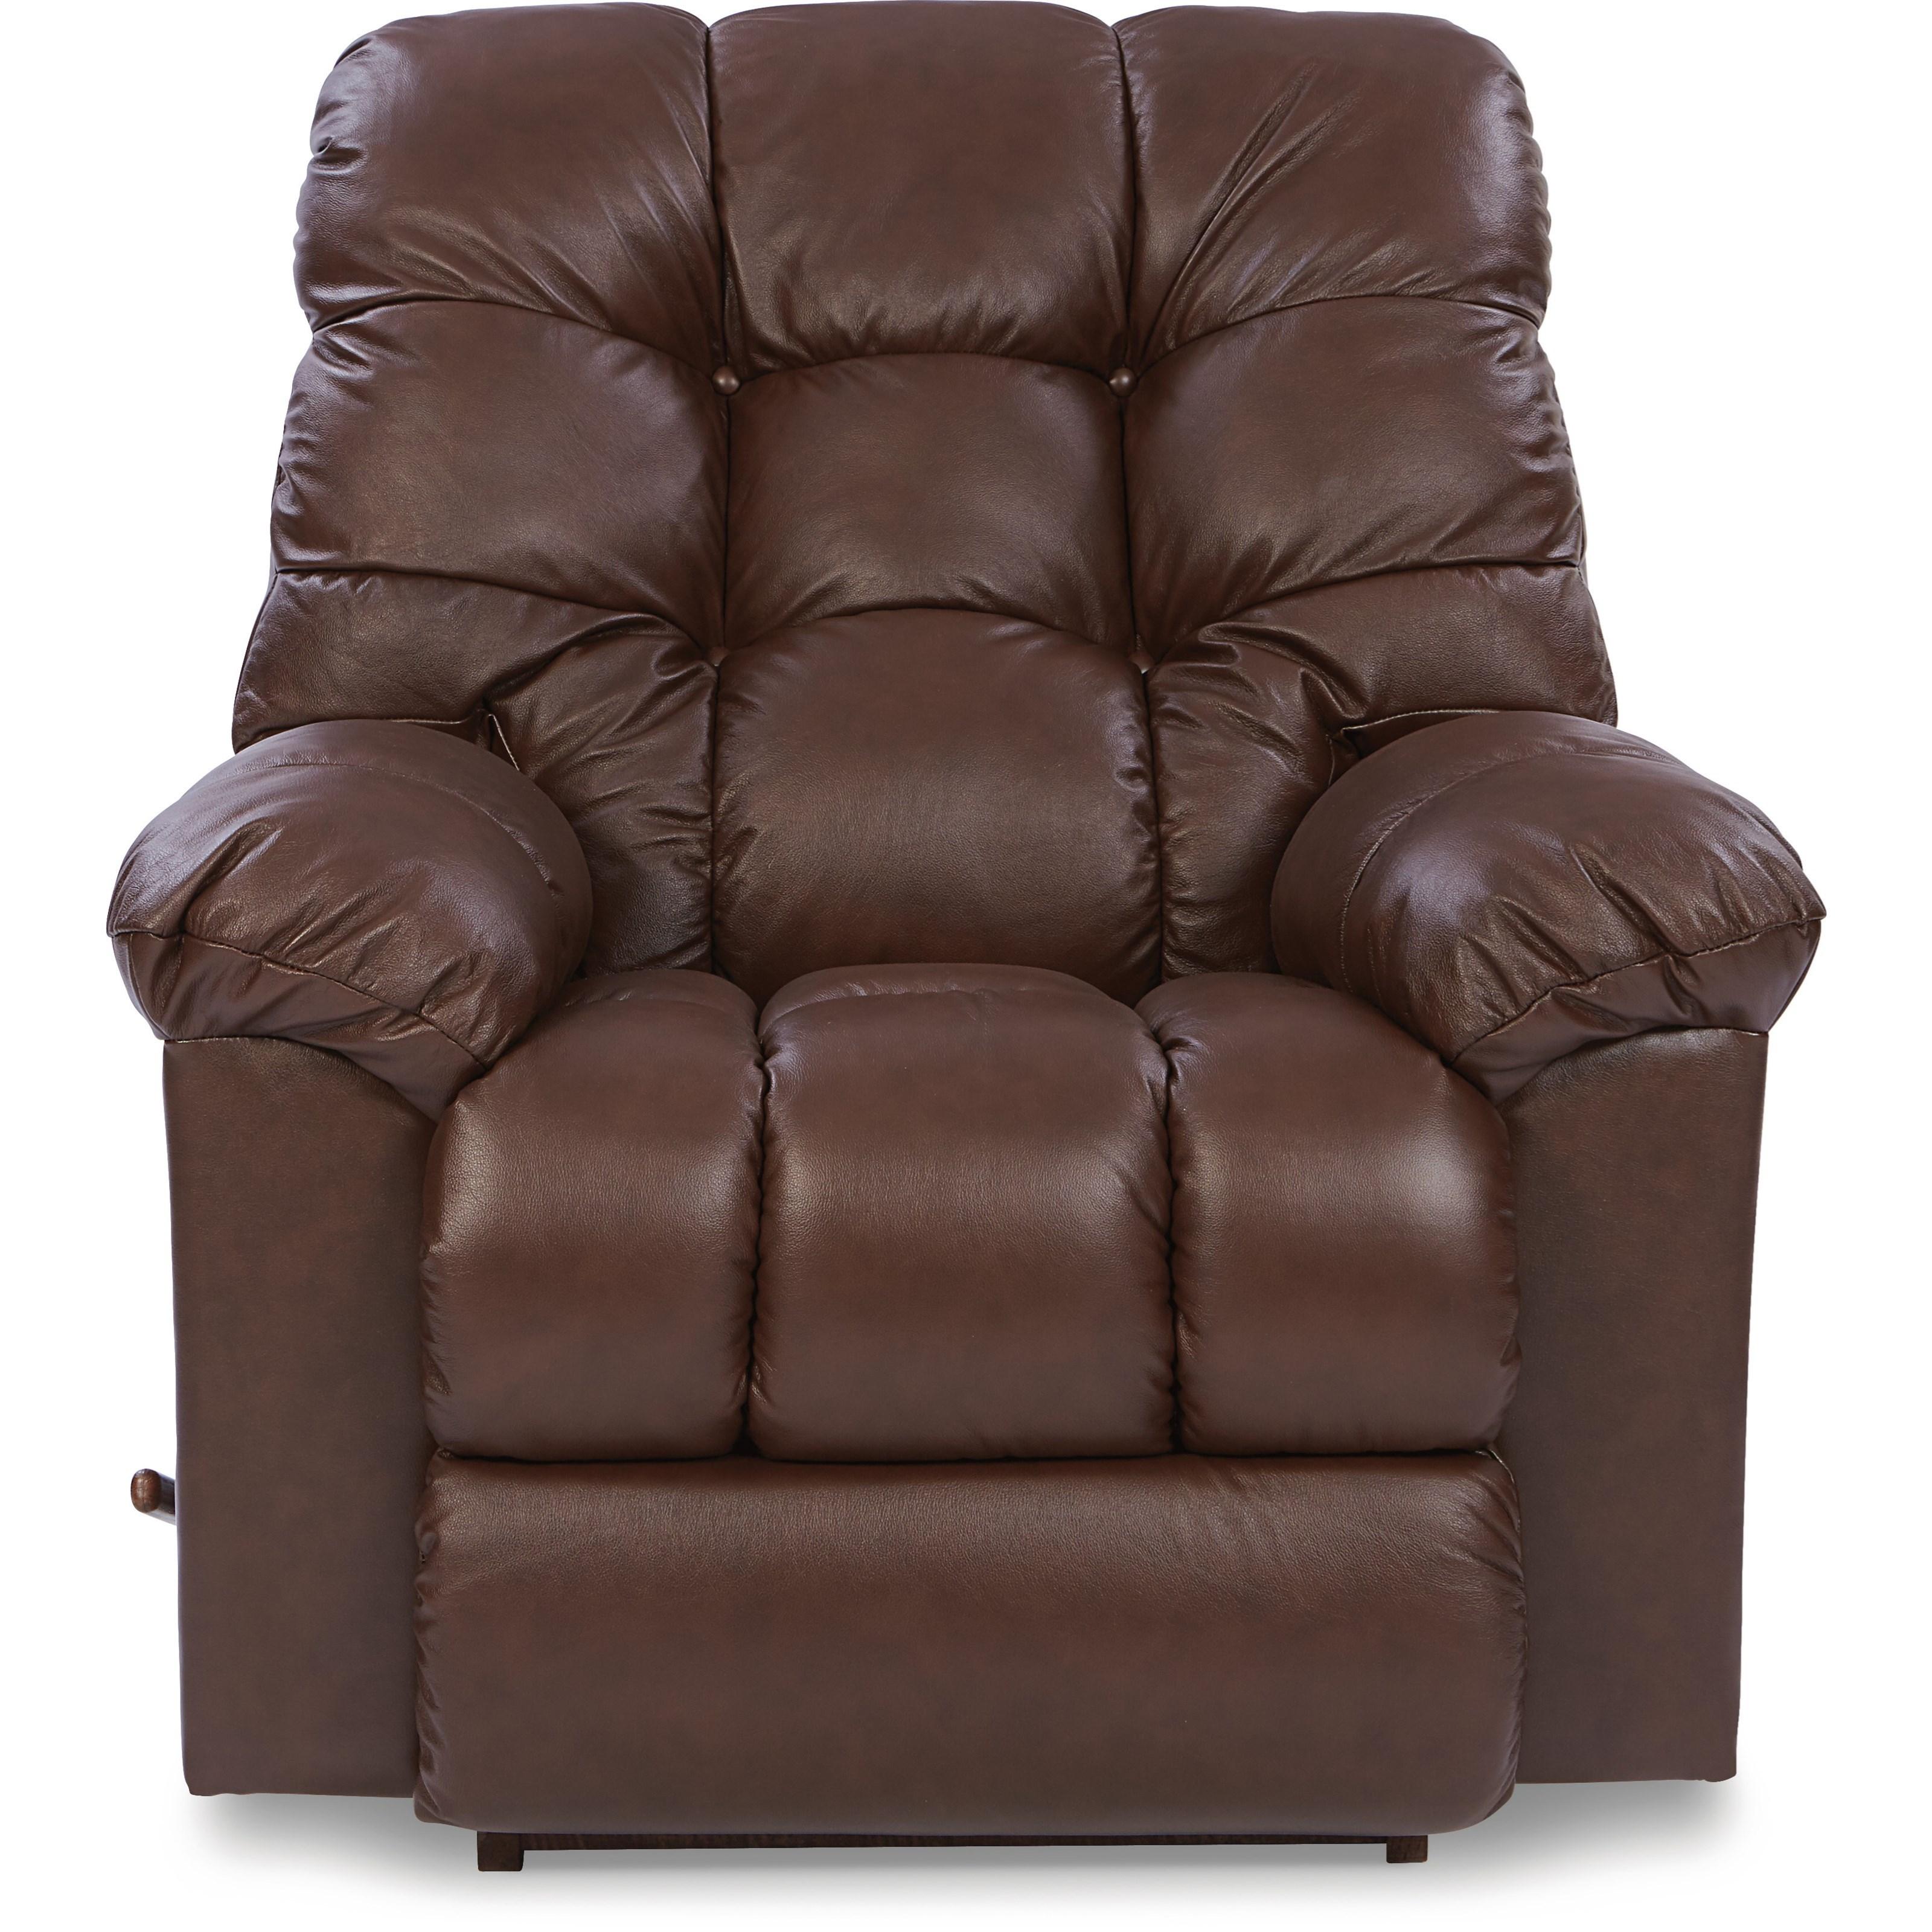 La Z Boy Gibson Reclina Rocker Reclining Chair Reid s Furniture